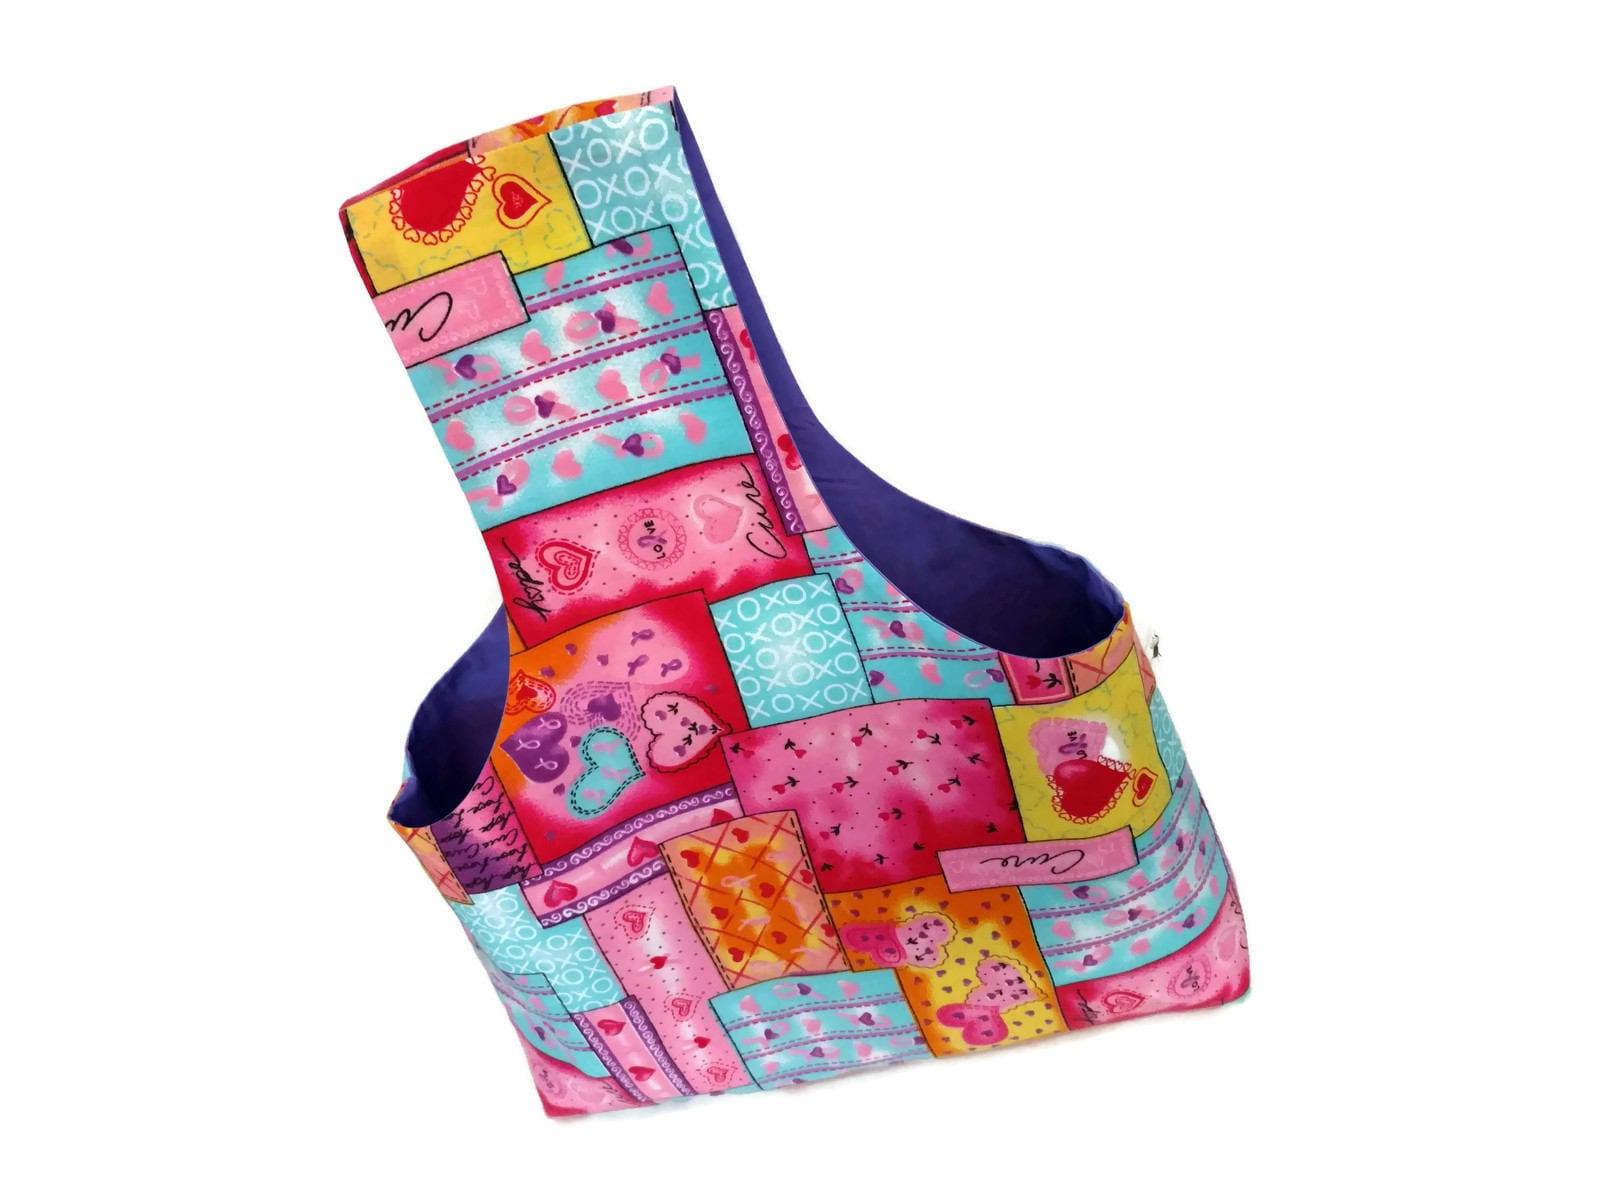 Knitting Yarn Bdo : Large yarn bag breast cancer awareness hearts and flowers